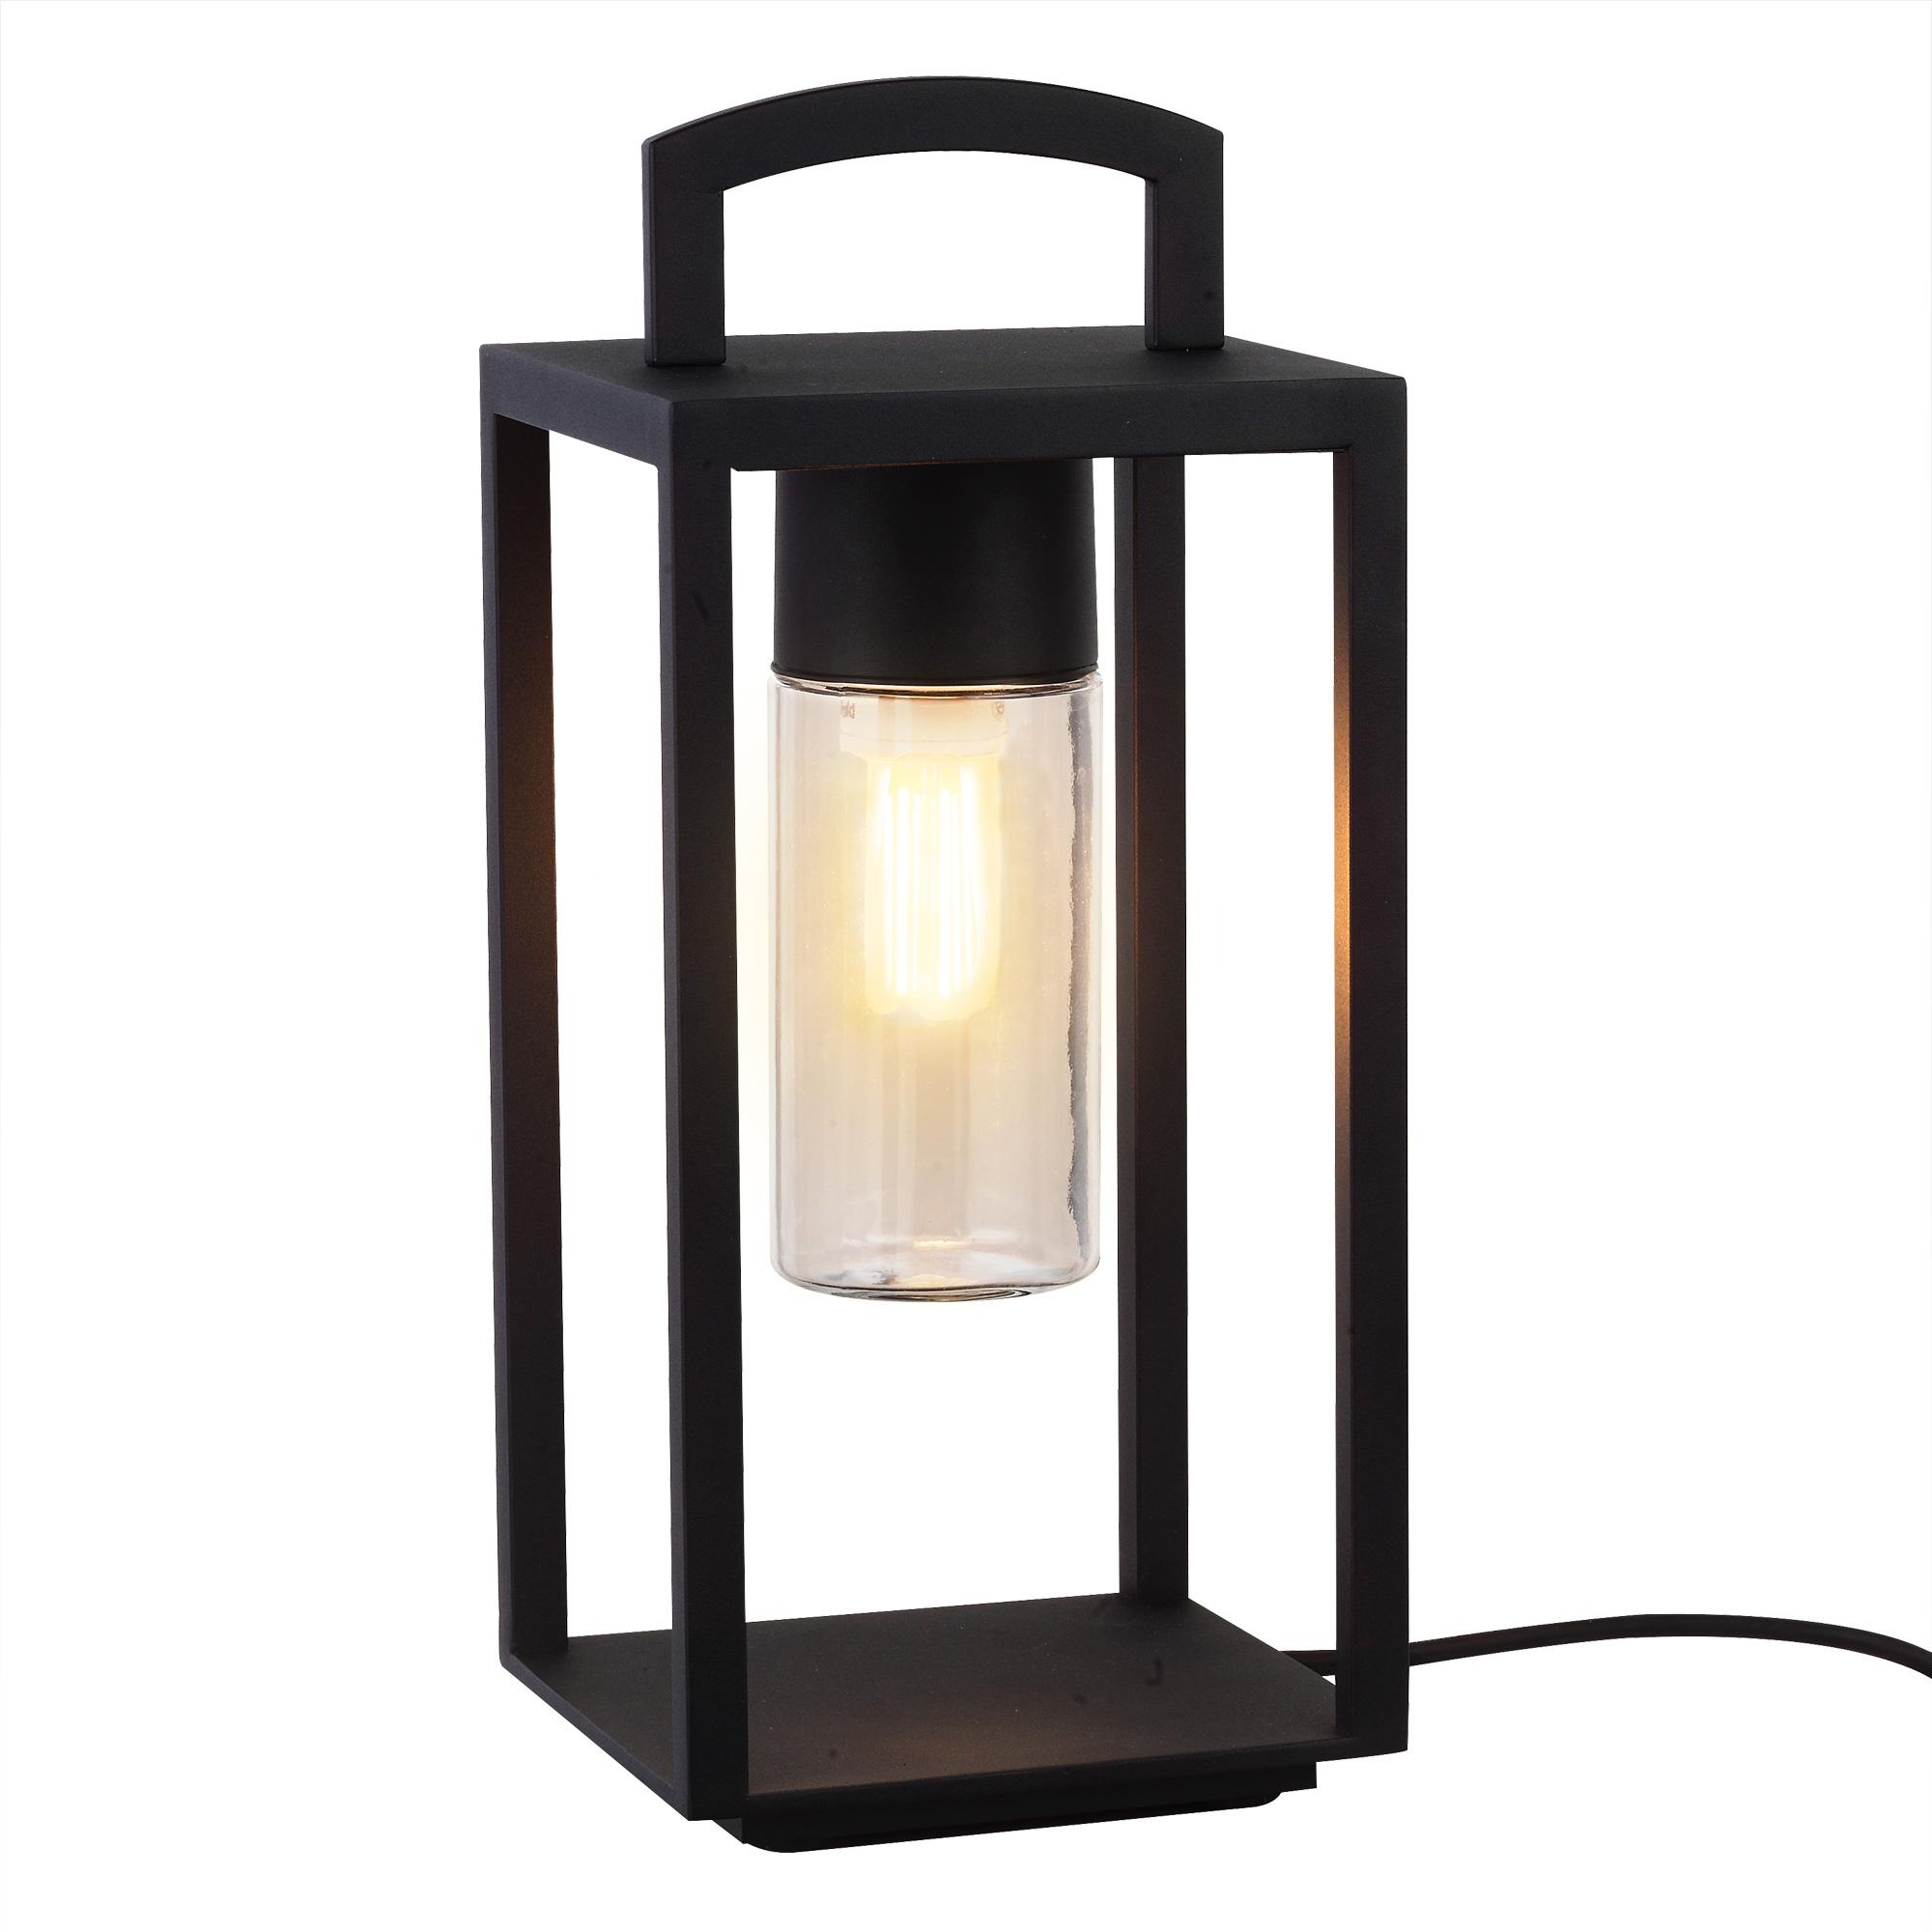 Lounge Zwart Portable Lamp Met Stekker